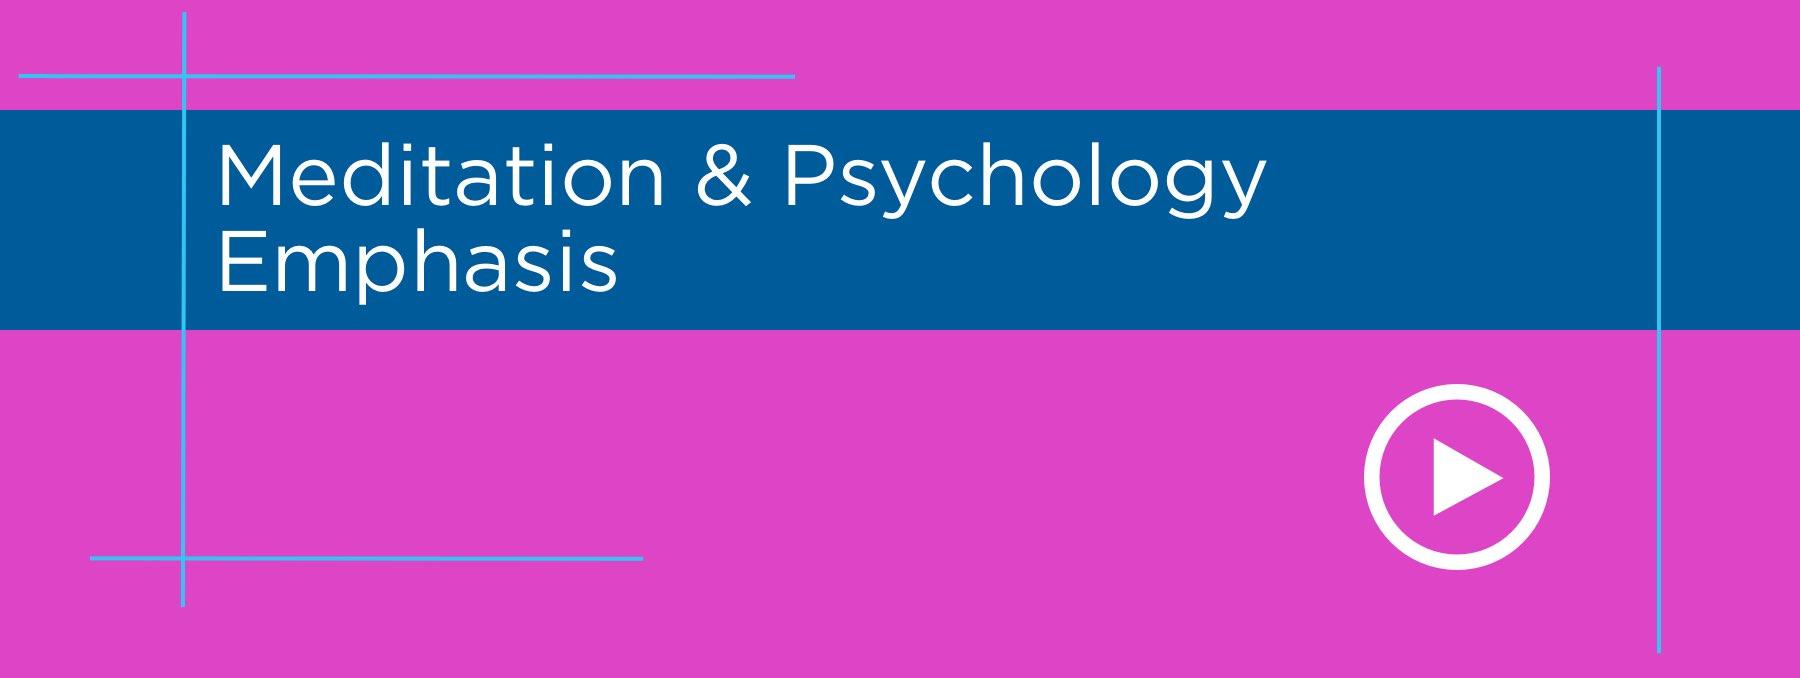 Meditation & Psychology Graphic